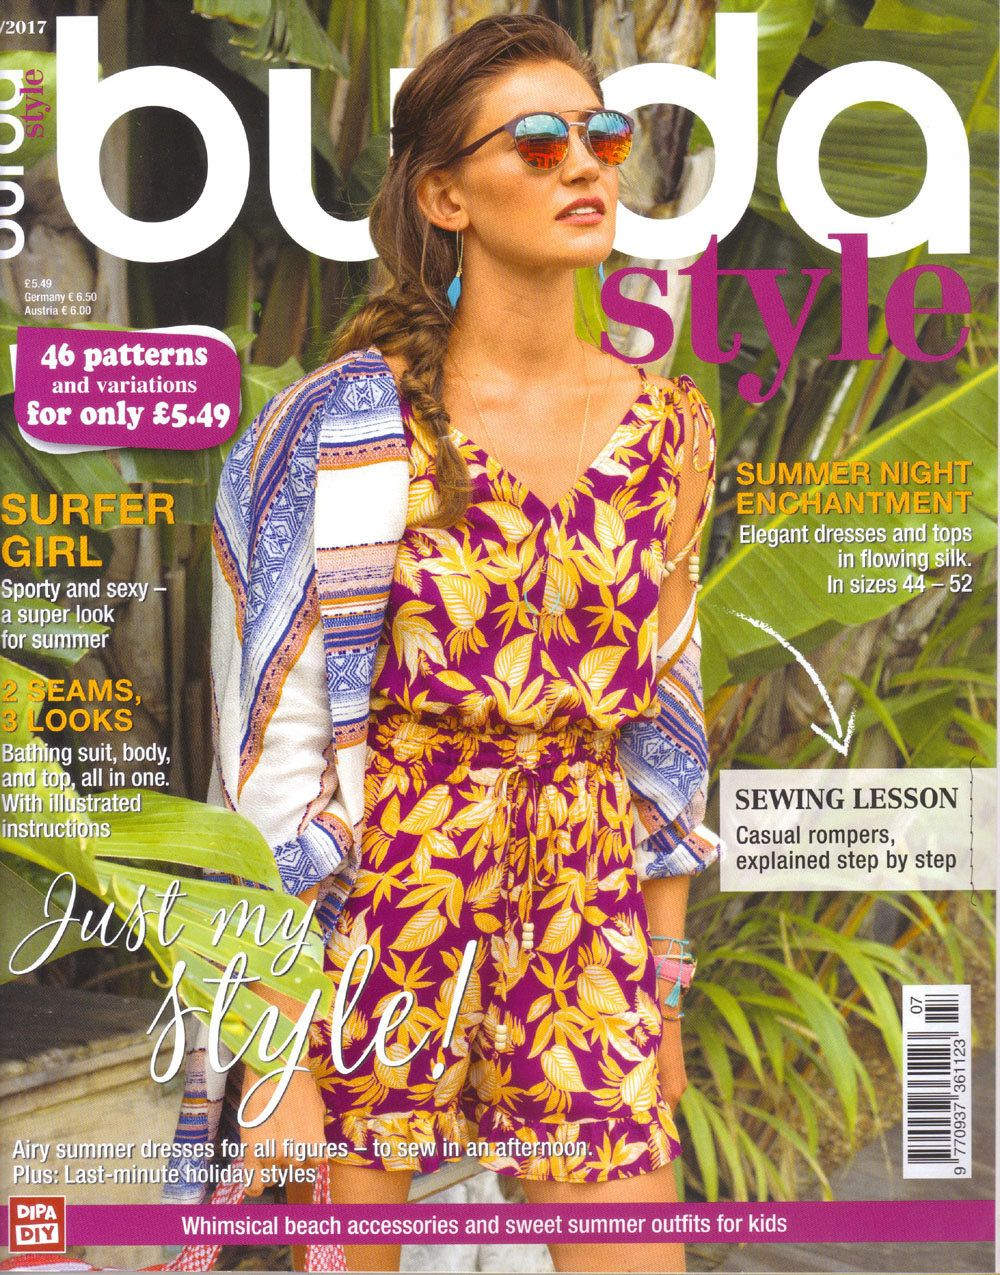 Burda style magazine 72017 english sewing patterns by burda style magazine 72017 english sewing patterns by honeyjamsuniques on etsy jeuxipadfo Image collections